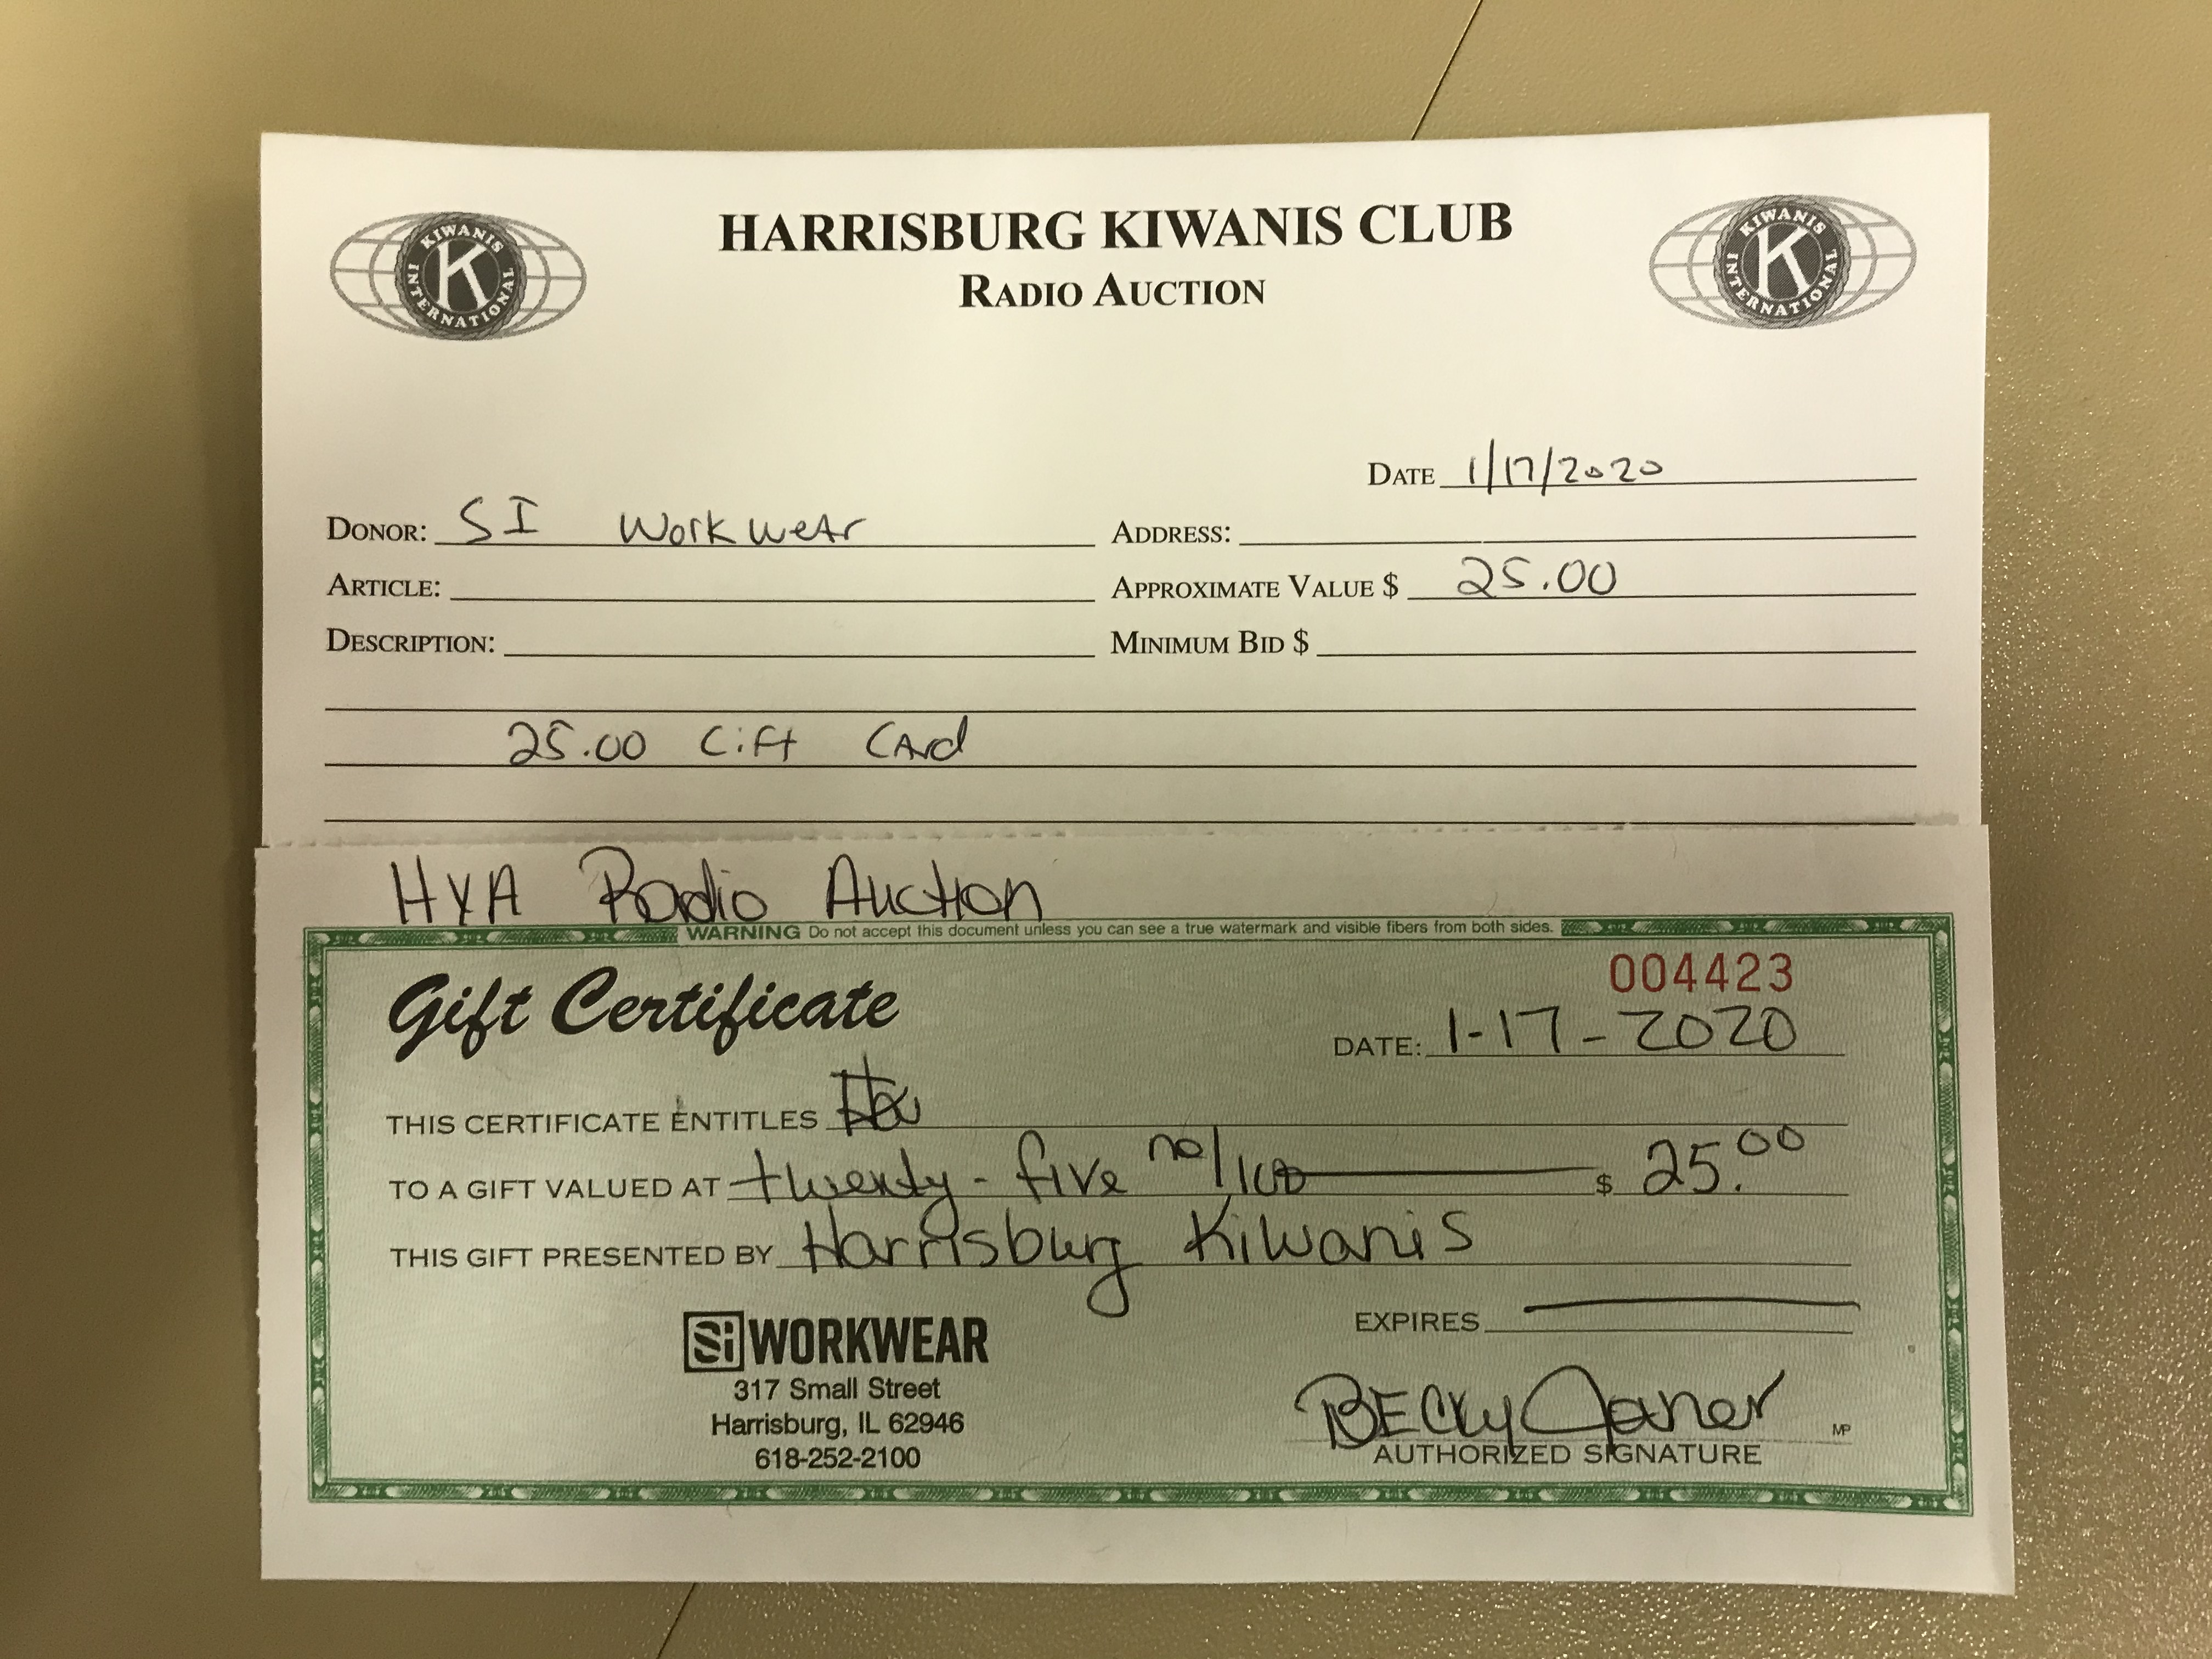 Item 108 - SI Workwear $25 Gift Certificate